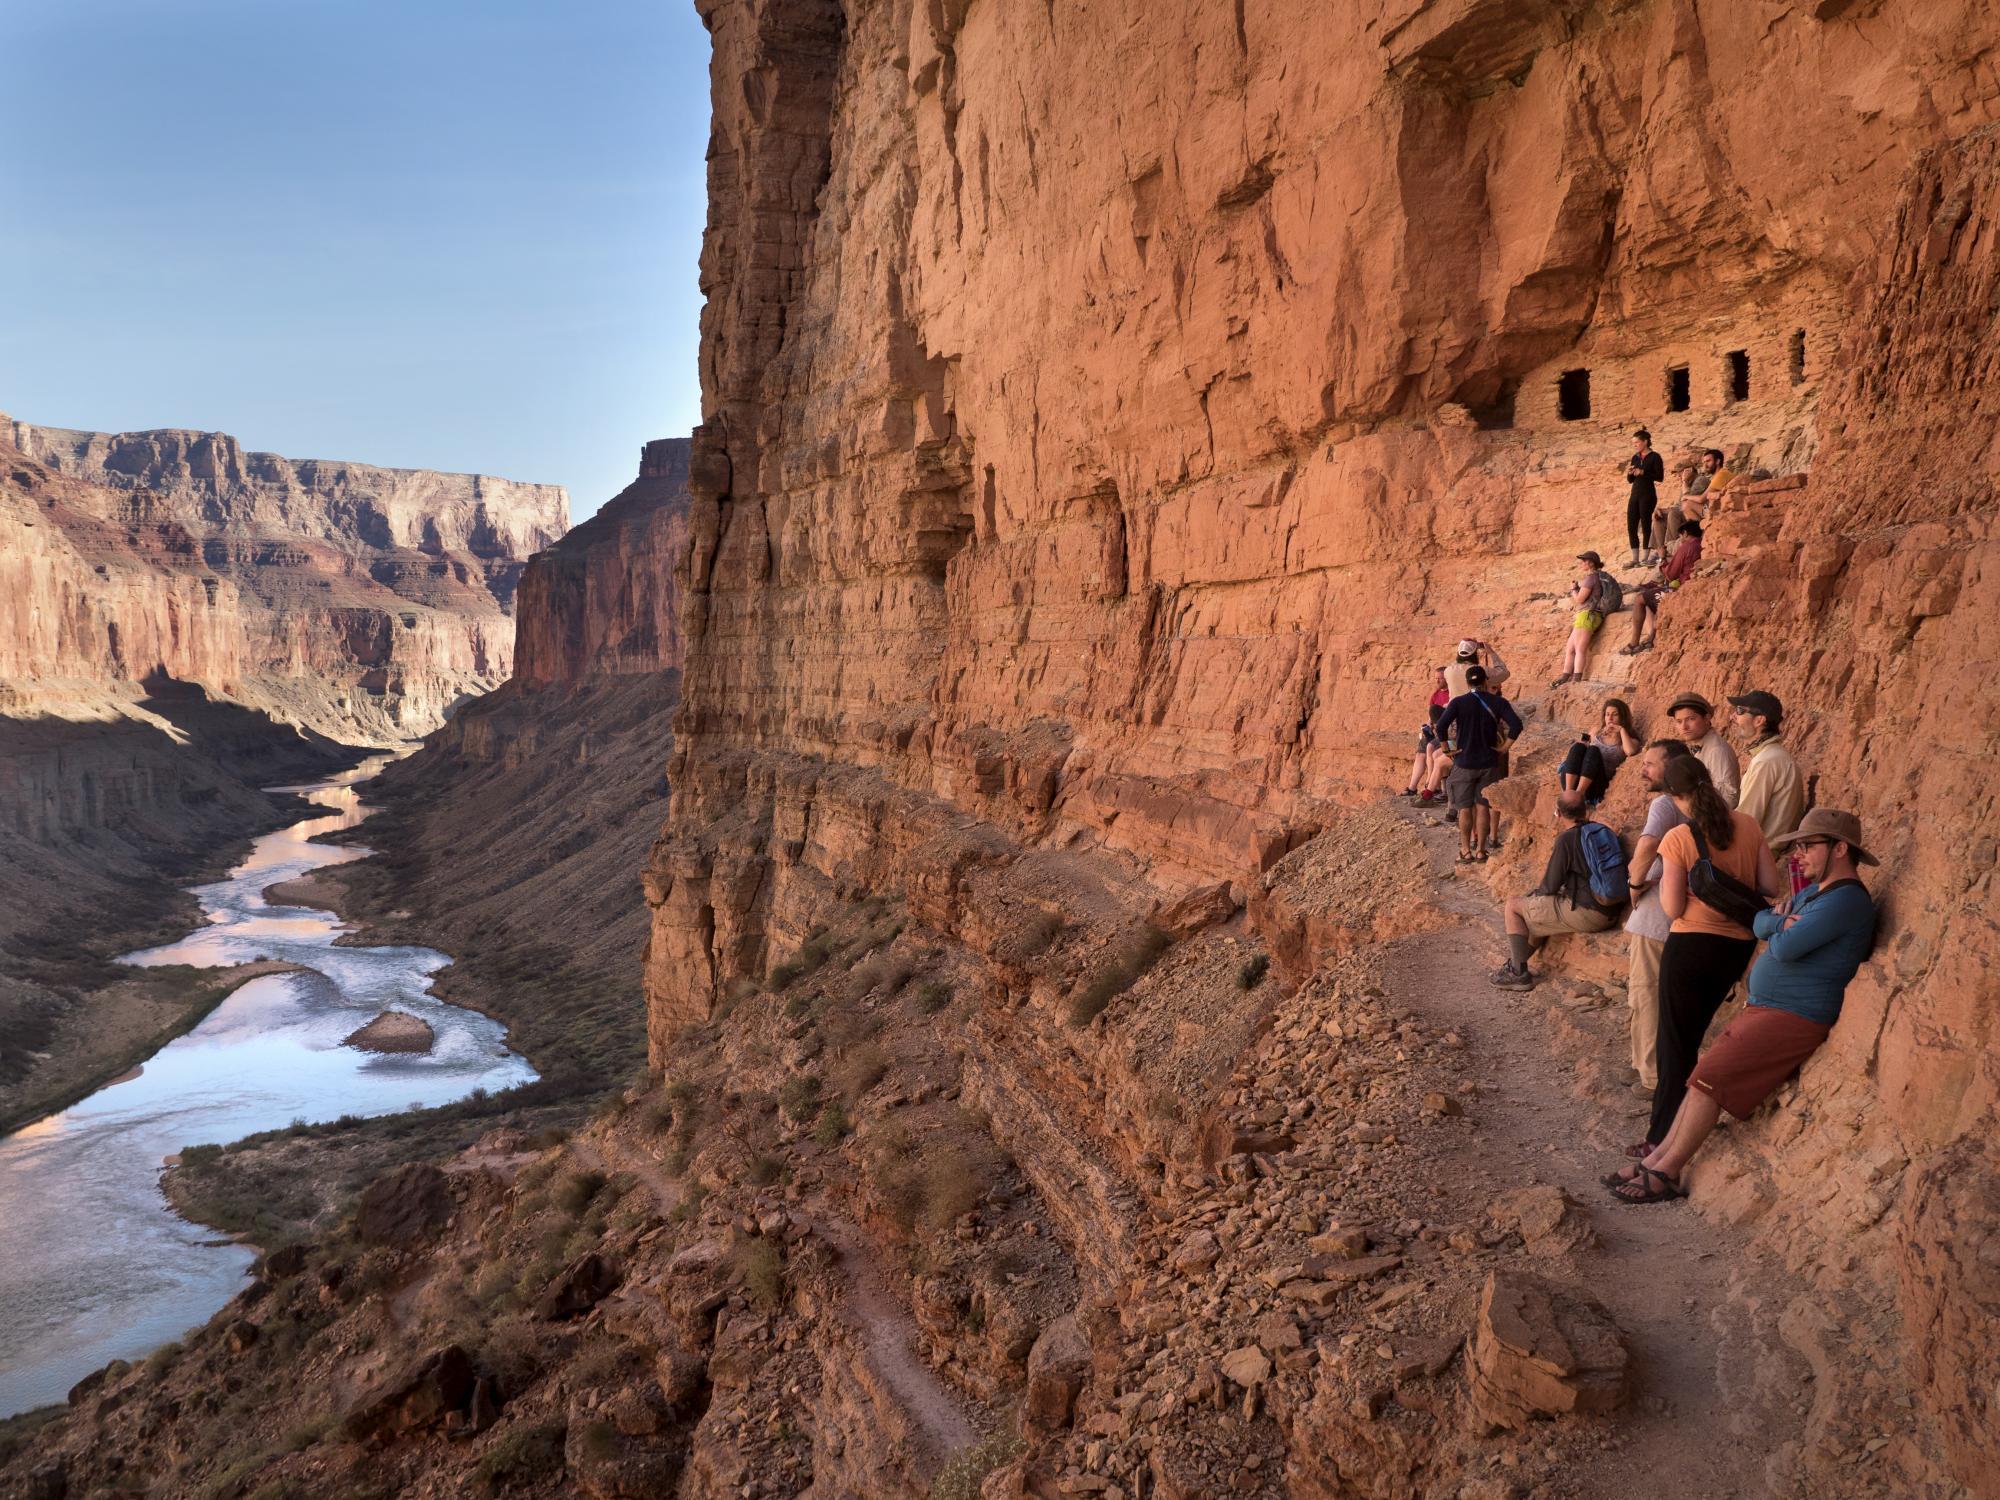 University students at Nankoweap granary ruins, overlooking Colorado River in Grand Canyon